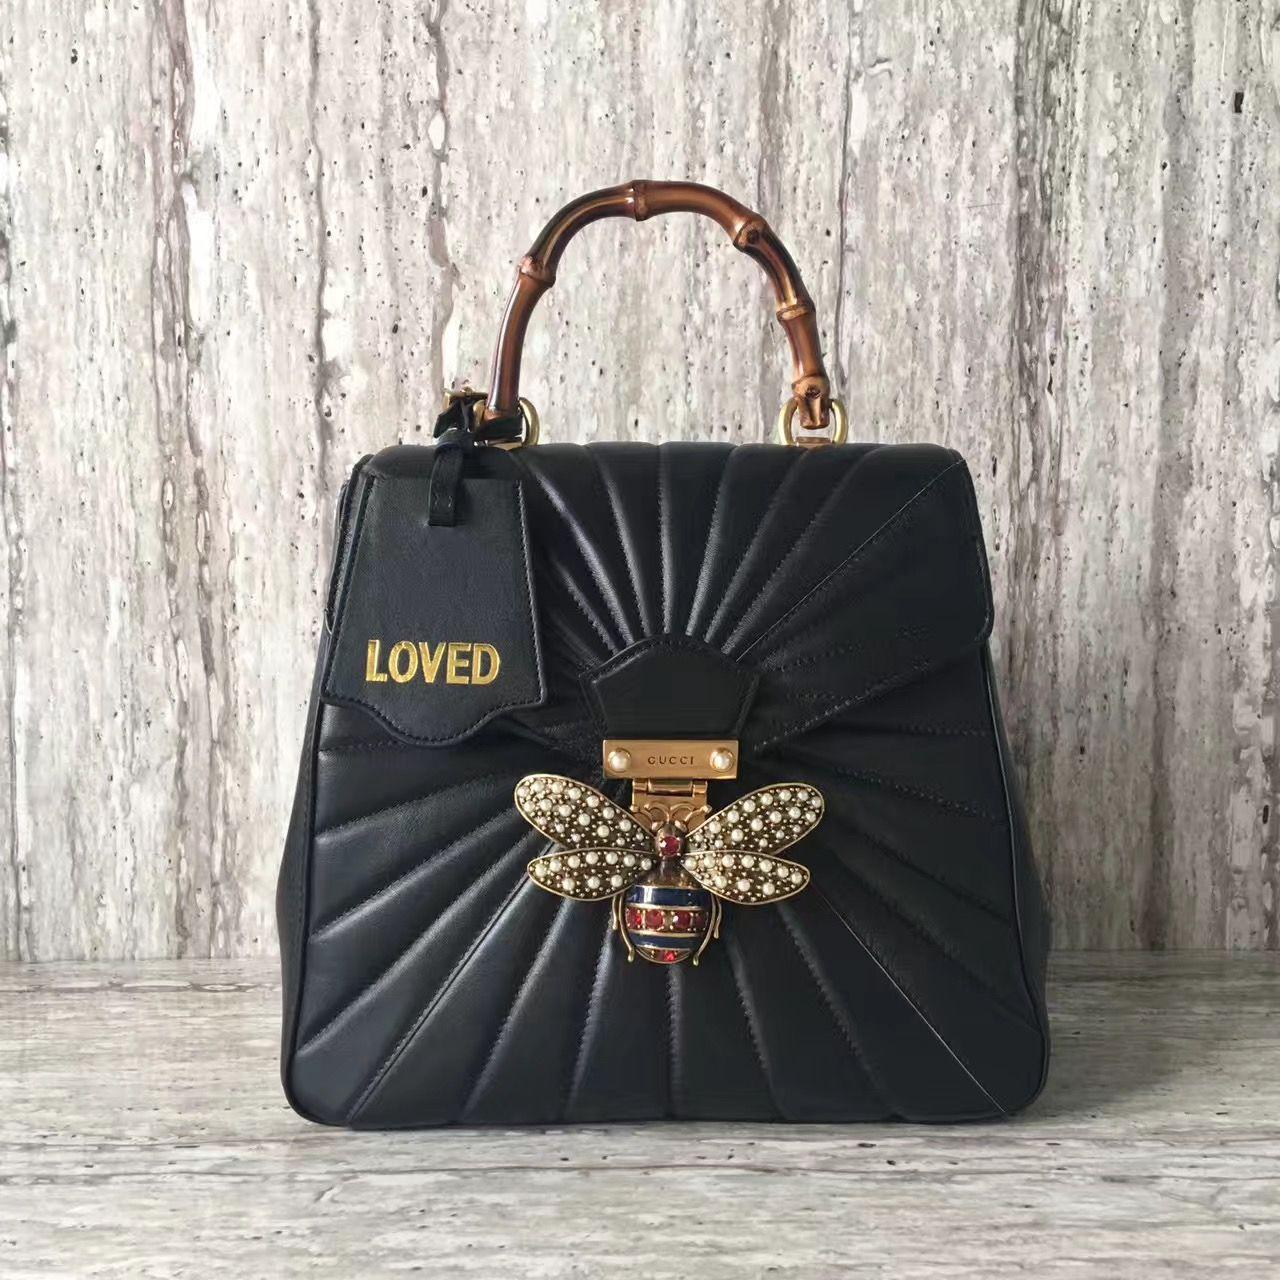 79c45f6de2f6 Gucci Queen Margaret Backpack 100% Authentic 80% Off | Authentic Gucci  Handbags